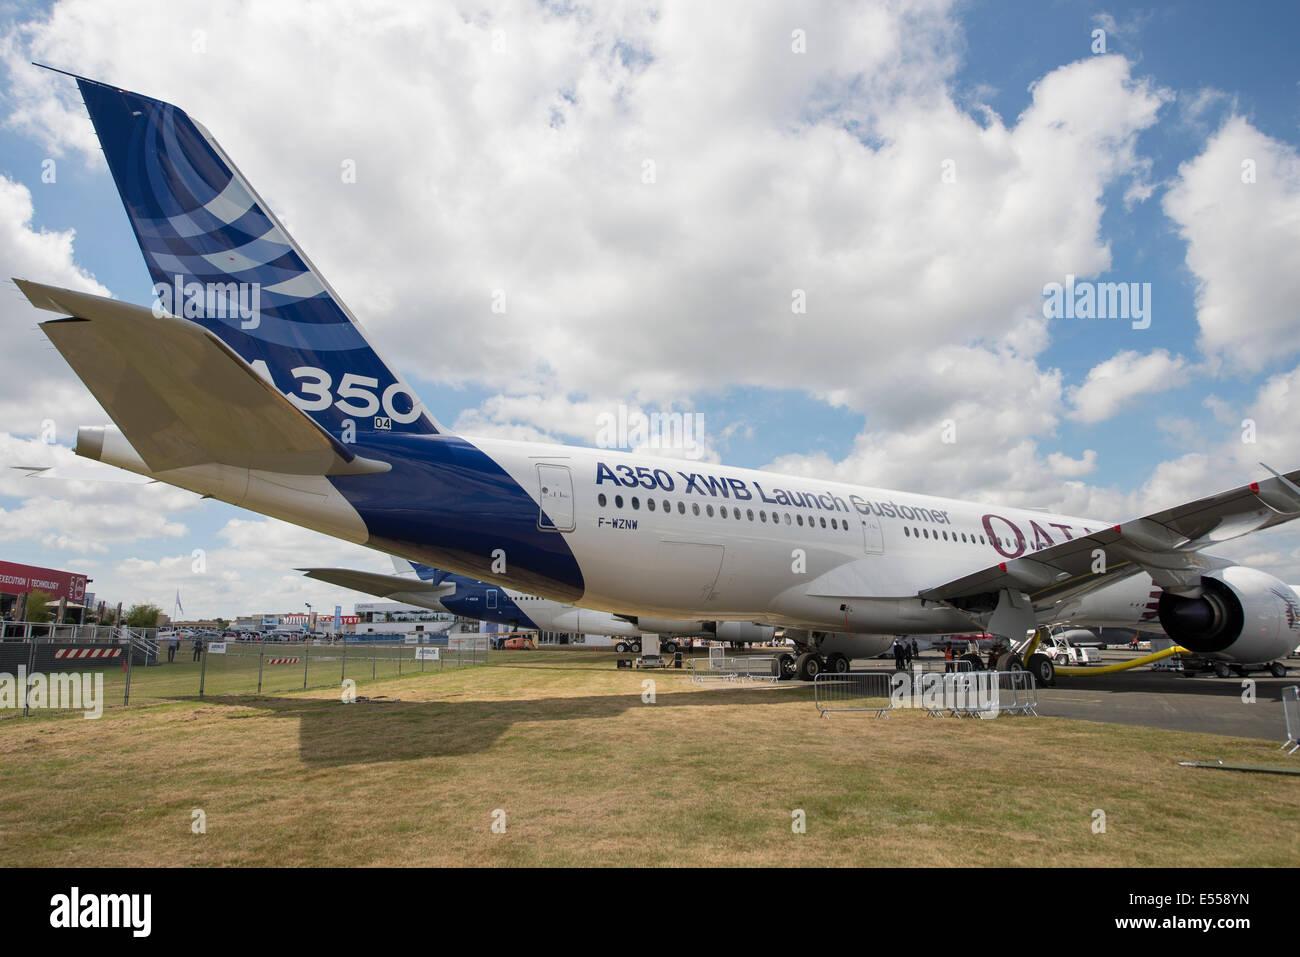 Airbus A350 XWB Launch Customer aircraft, Qatar Airways, Farnborough International Airshow 2014 - Stock Image